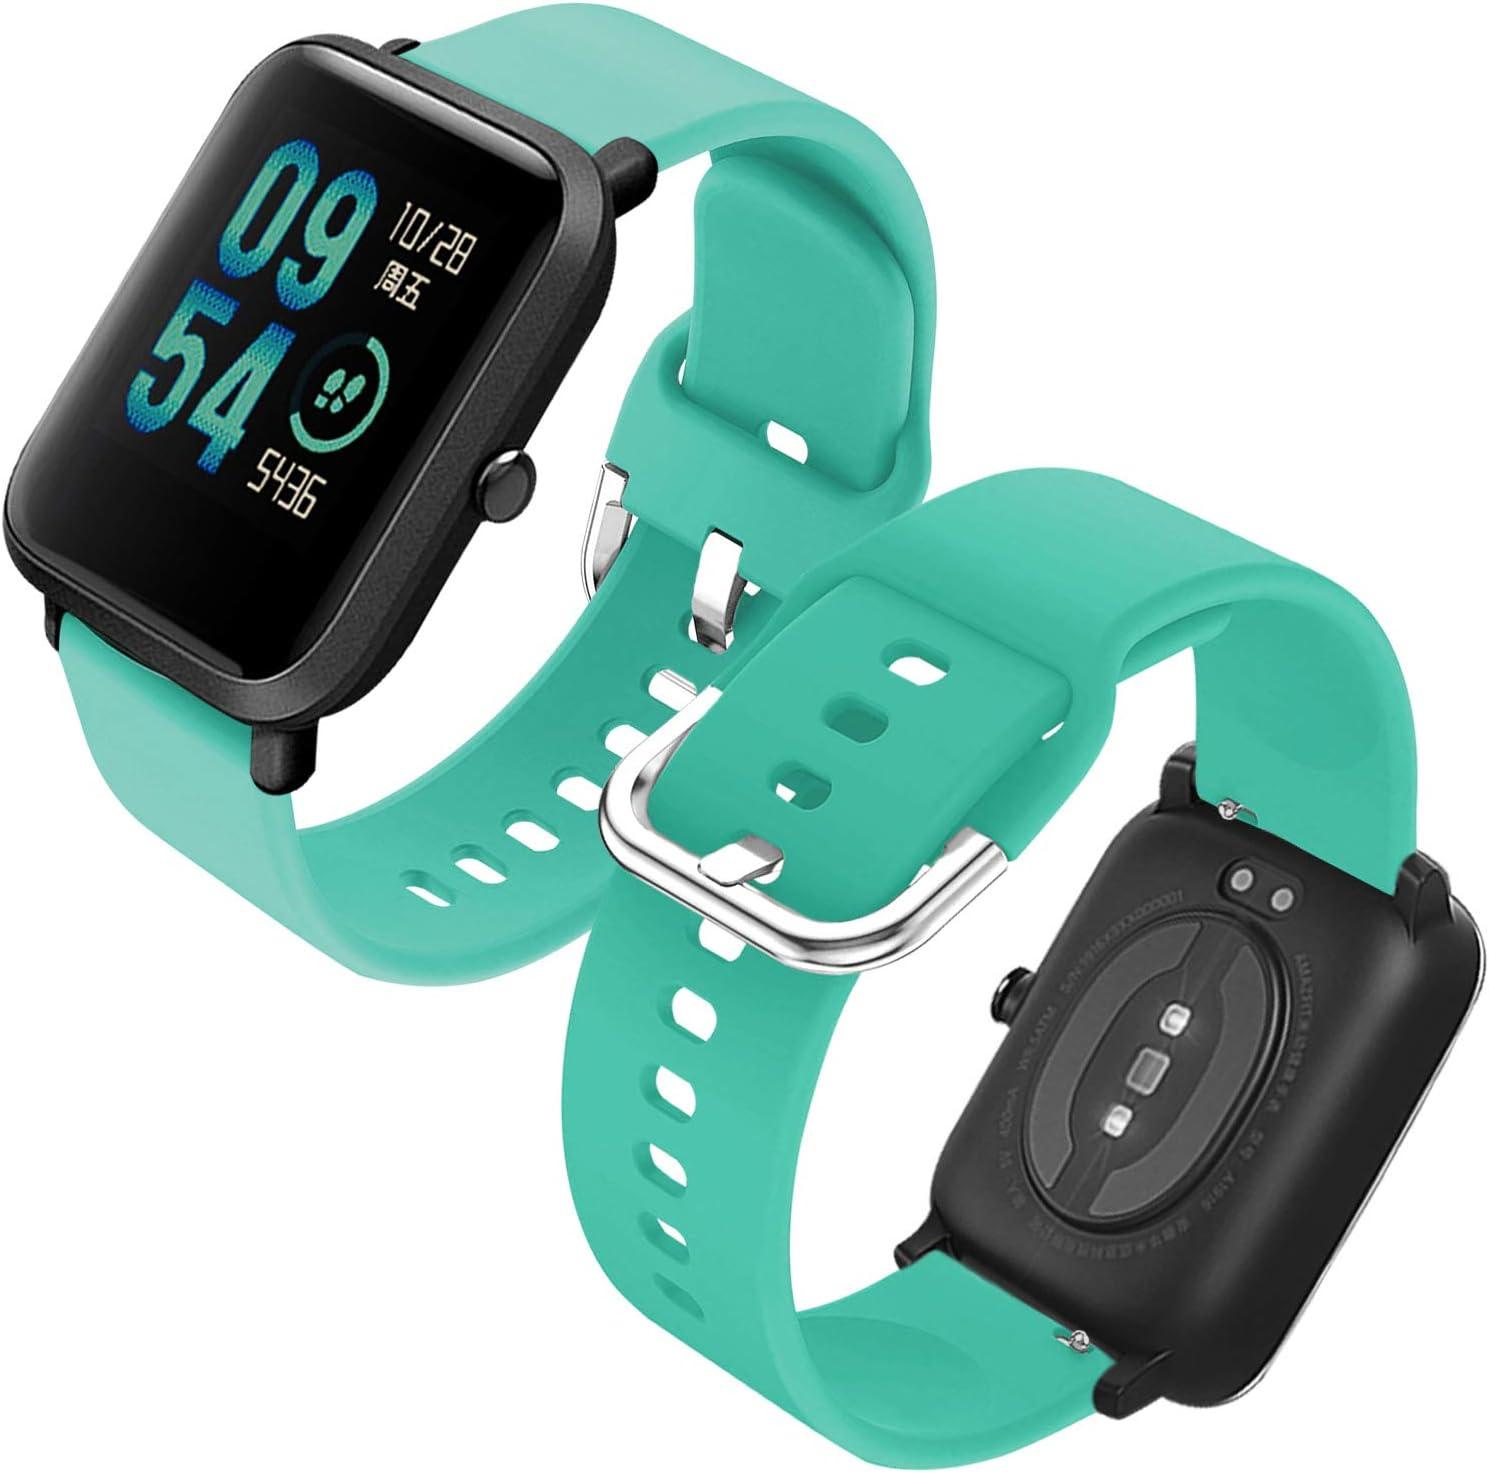 Th-some Correa para Amazfit GTS Impermeable Universal - Reemplazo de Pulsera Ajustable para Xiaomi Huami Amazfit Bip/Amazfit Bip bit Lite Youth/Amazfit GTR 42mm Watch, Sin Tracker (Verde Menta)